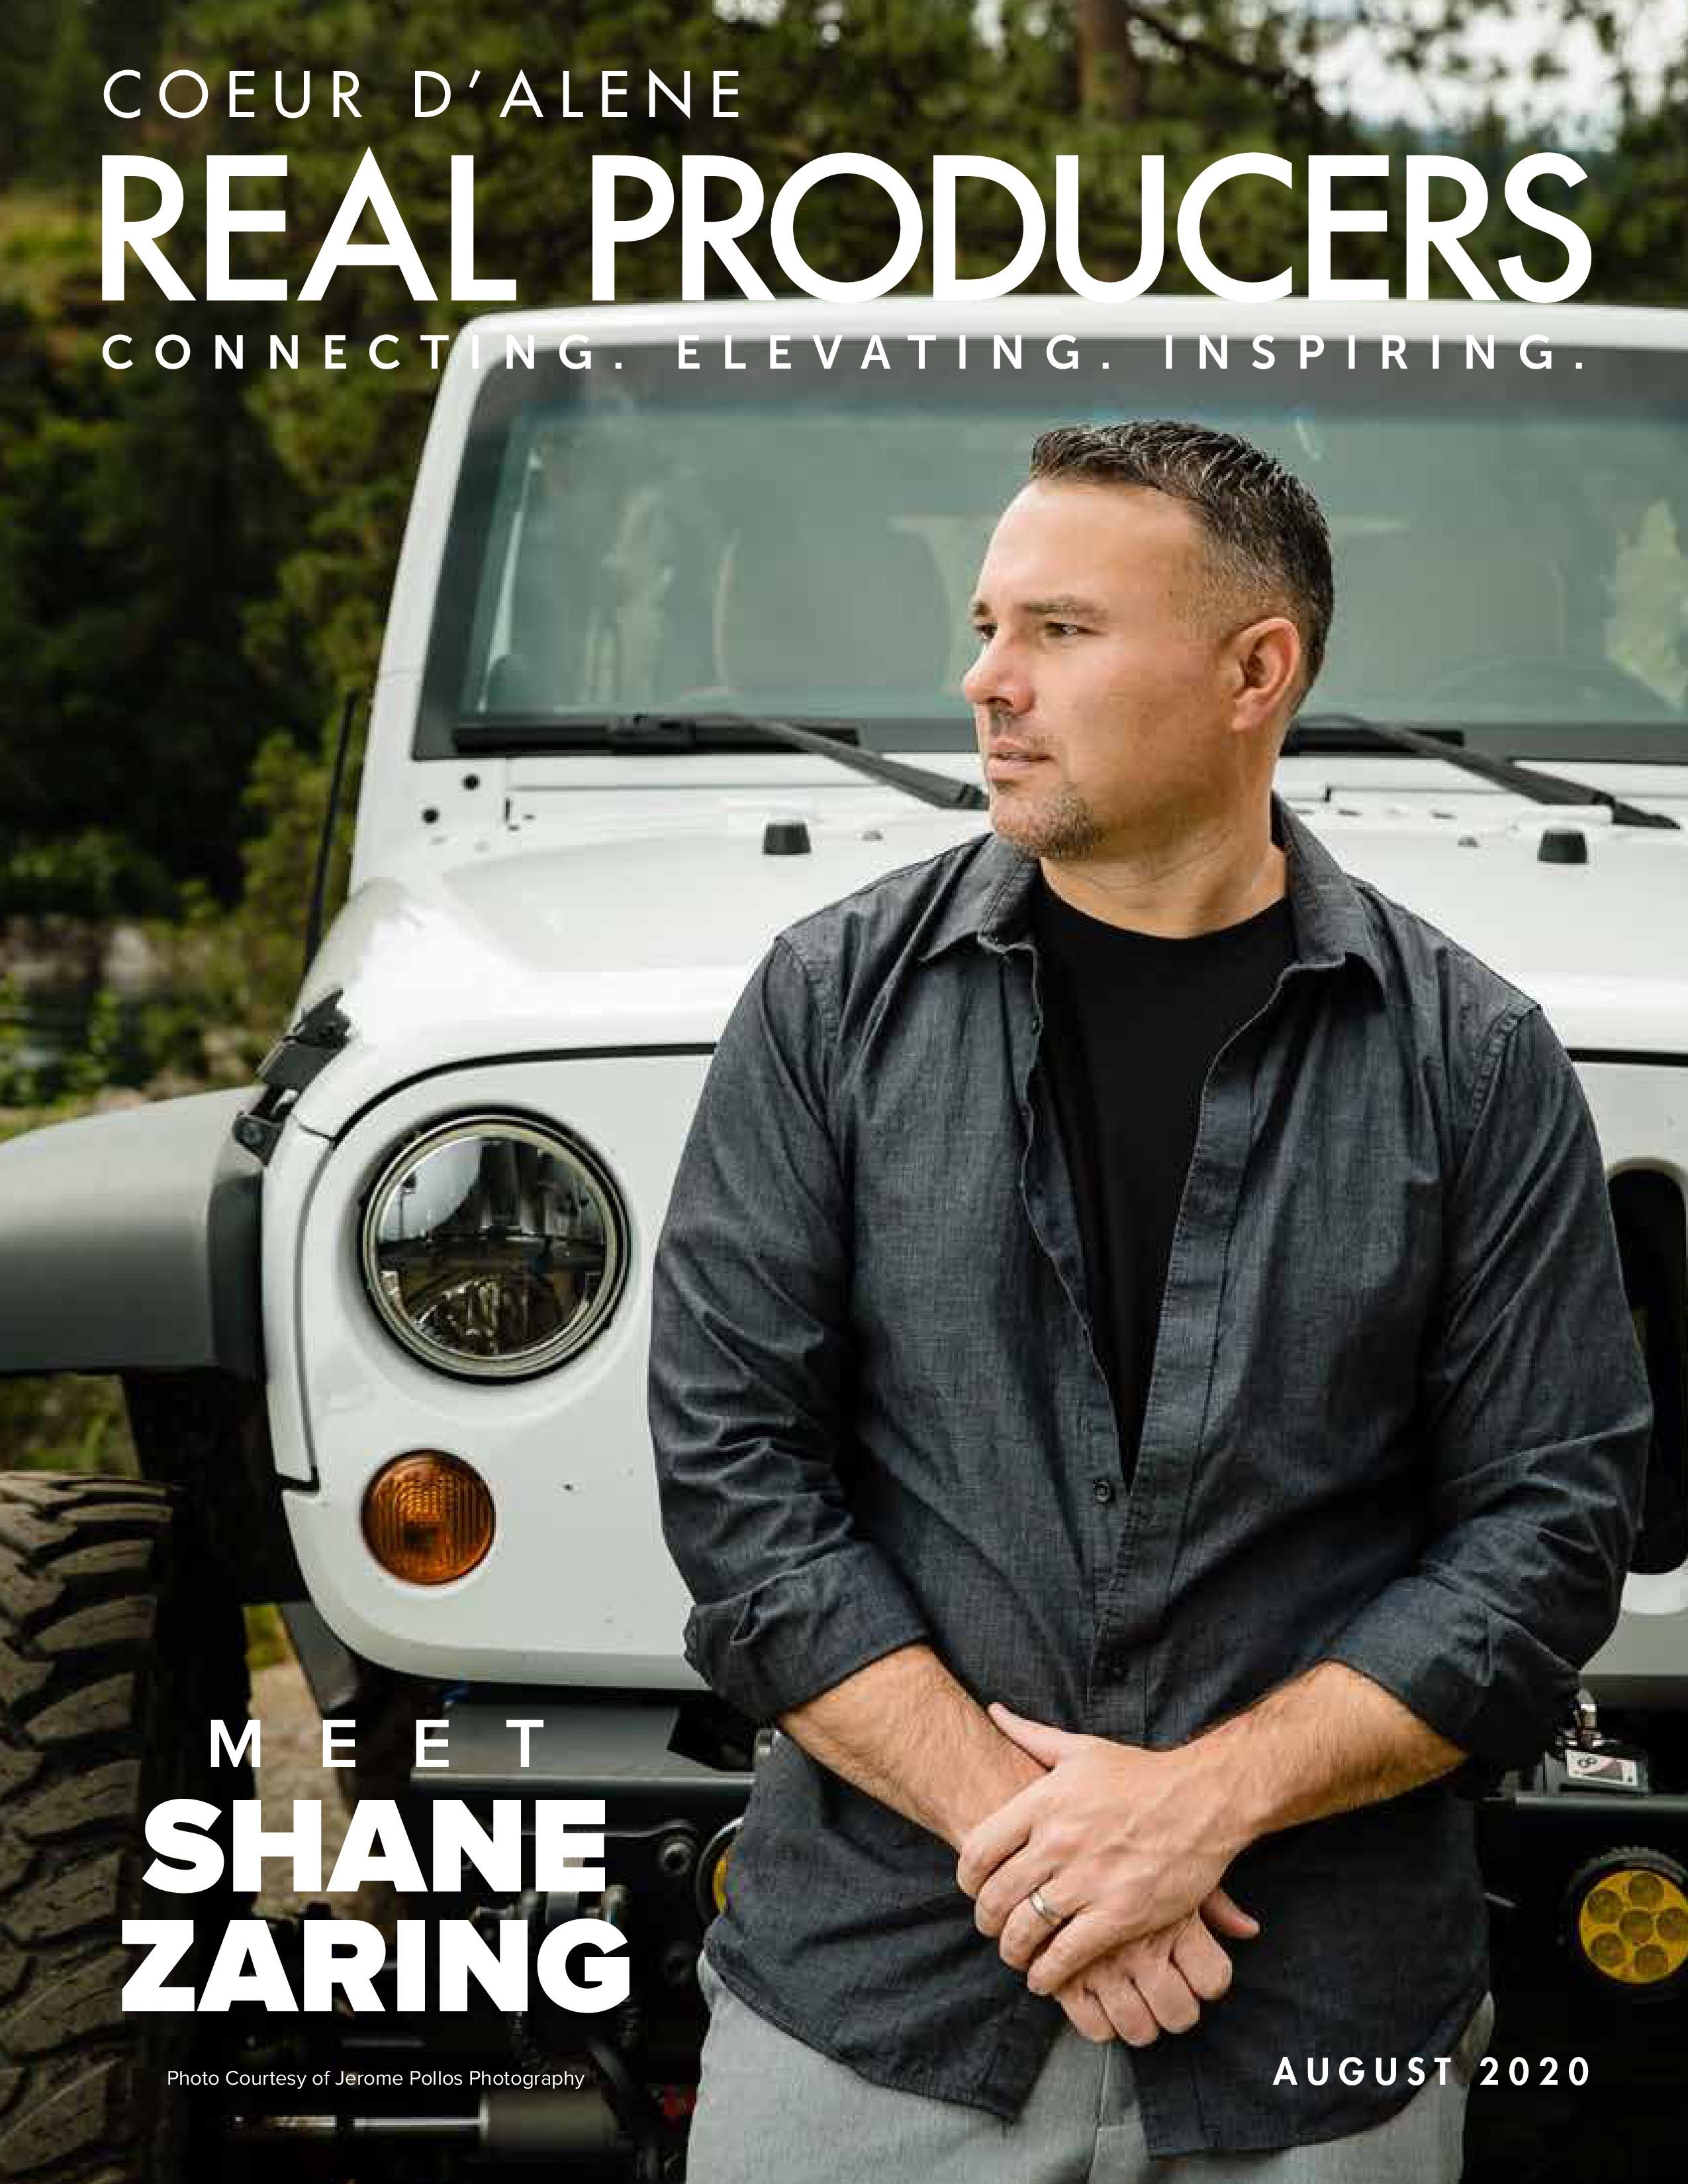 Coeur D'Alene Real Producers 2020-08-01